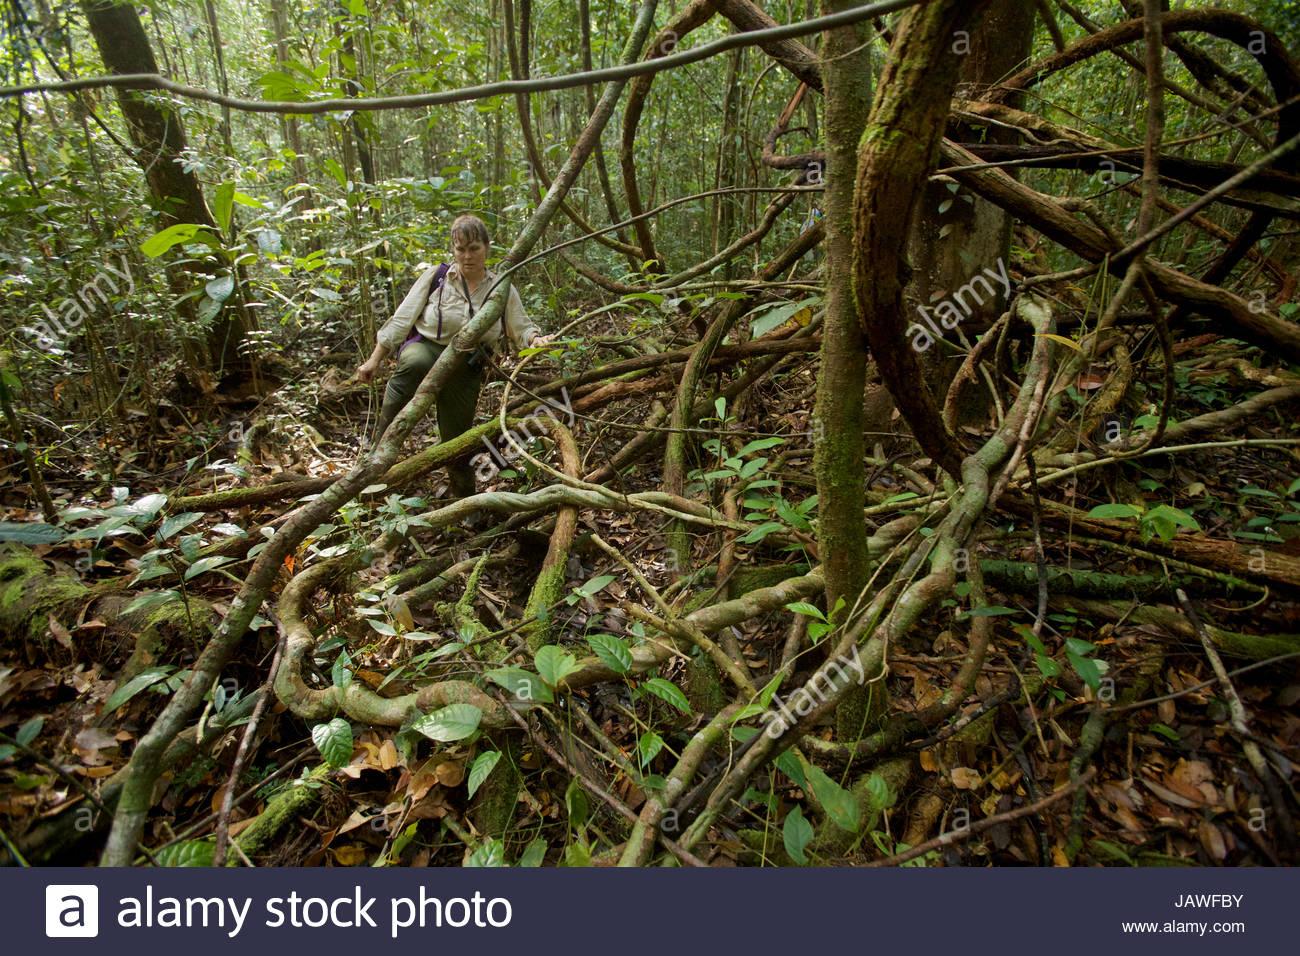 Orangutan researcher bushwhacking through freshwater swamp forest while following a wild orangutan. - Stock Image